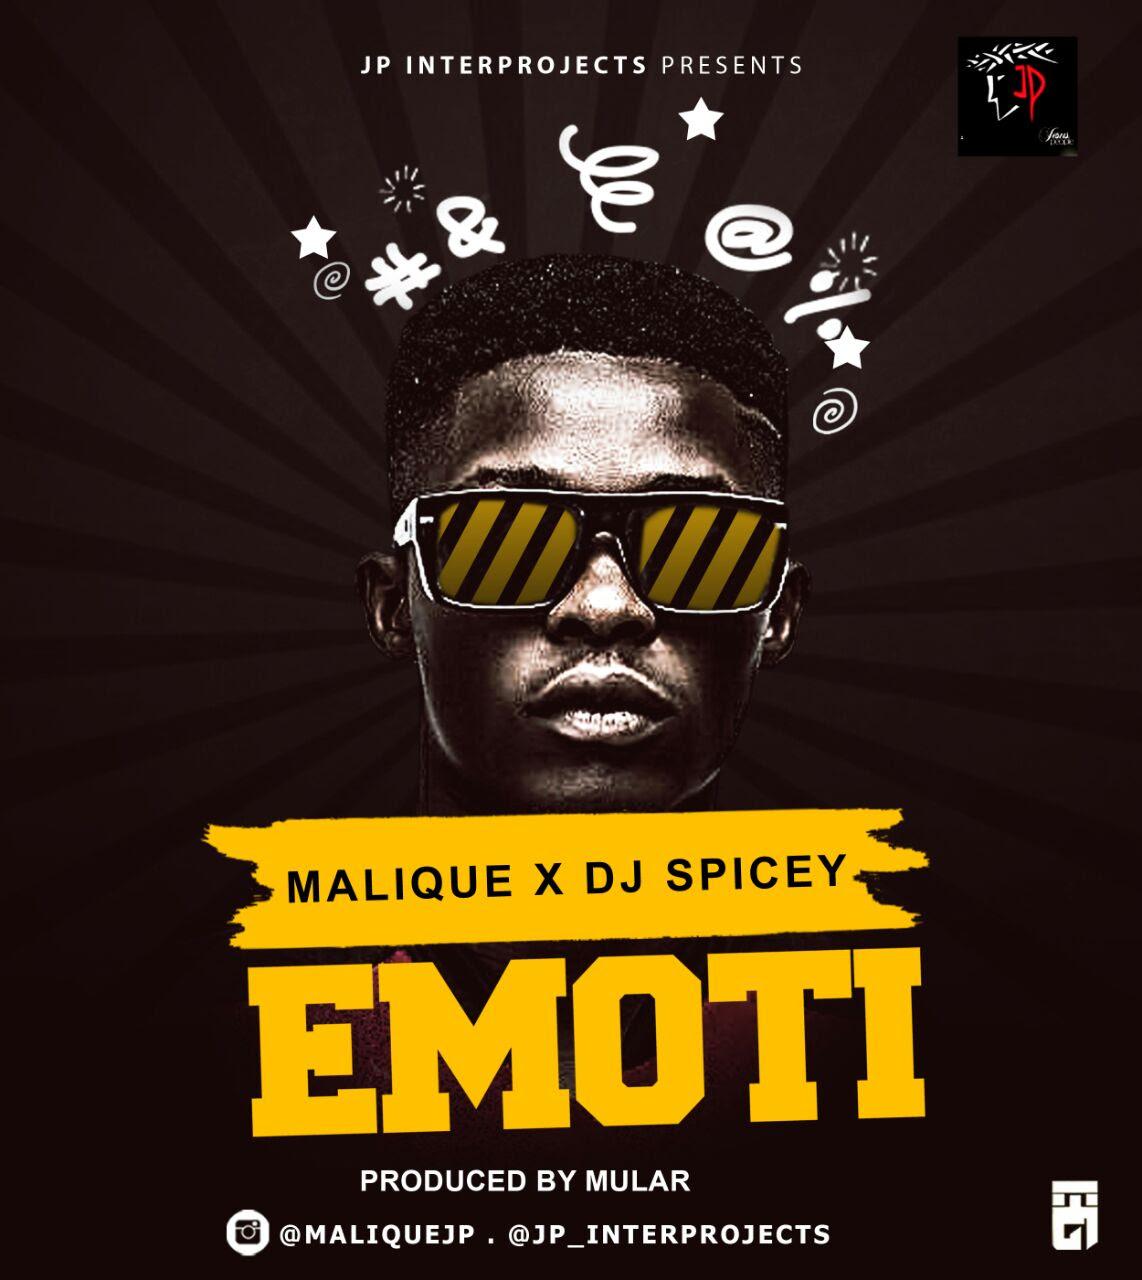 Malique ft. DJ Spicey – Emoti (Prod. MULAR)